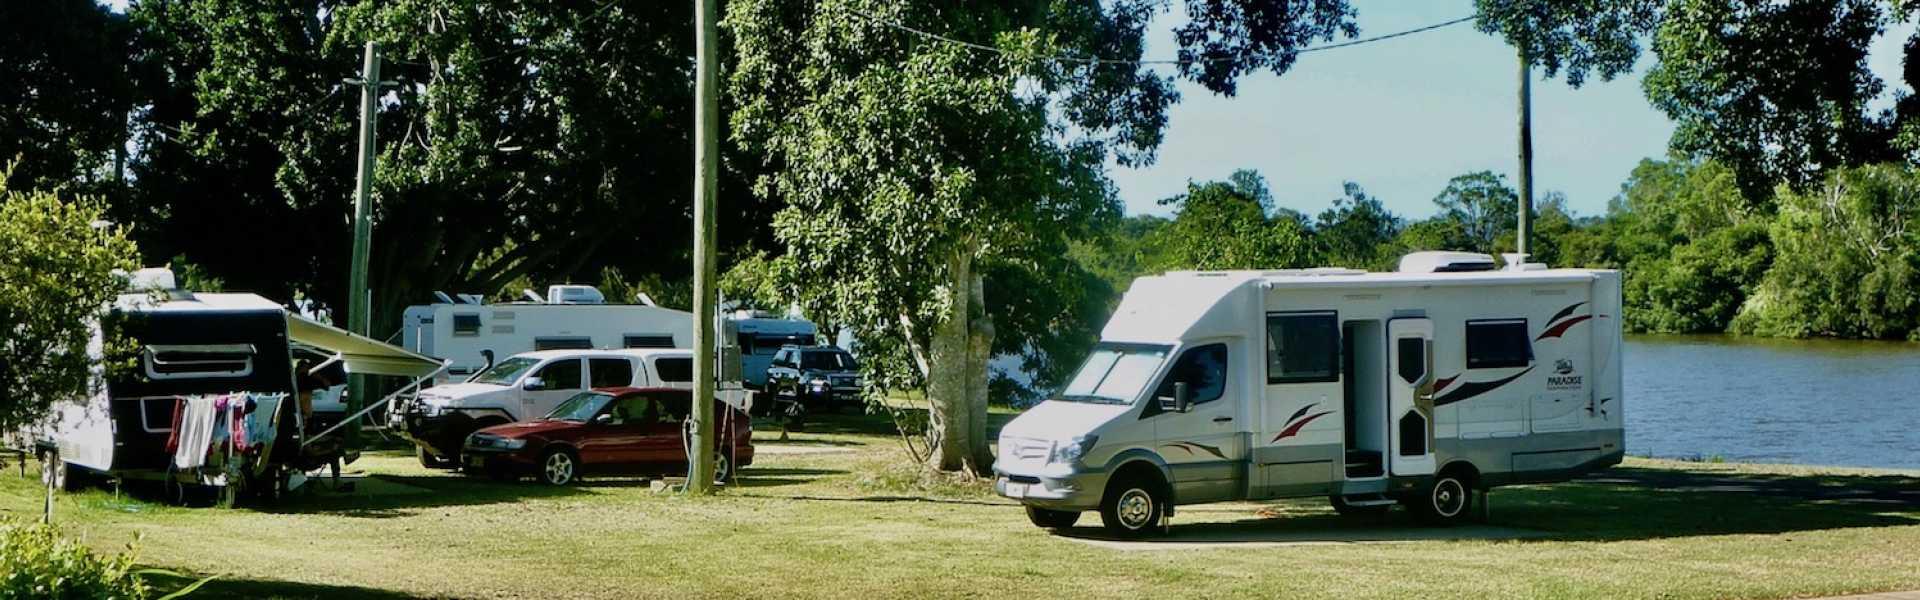 Kui Parks, Coraki Riverside Caravan Park, Caravan Park